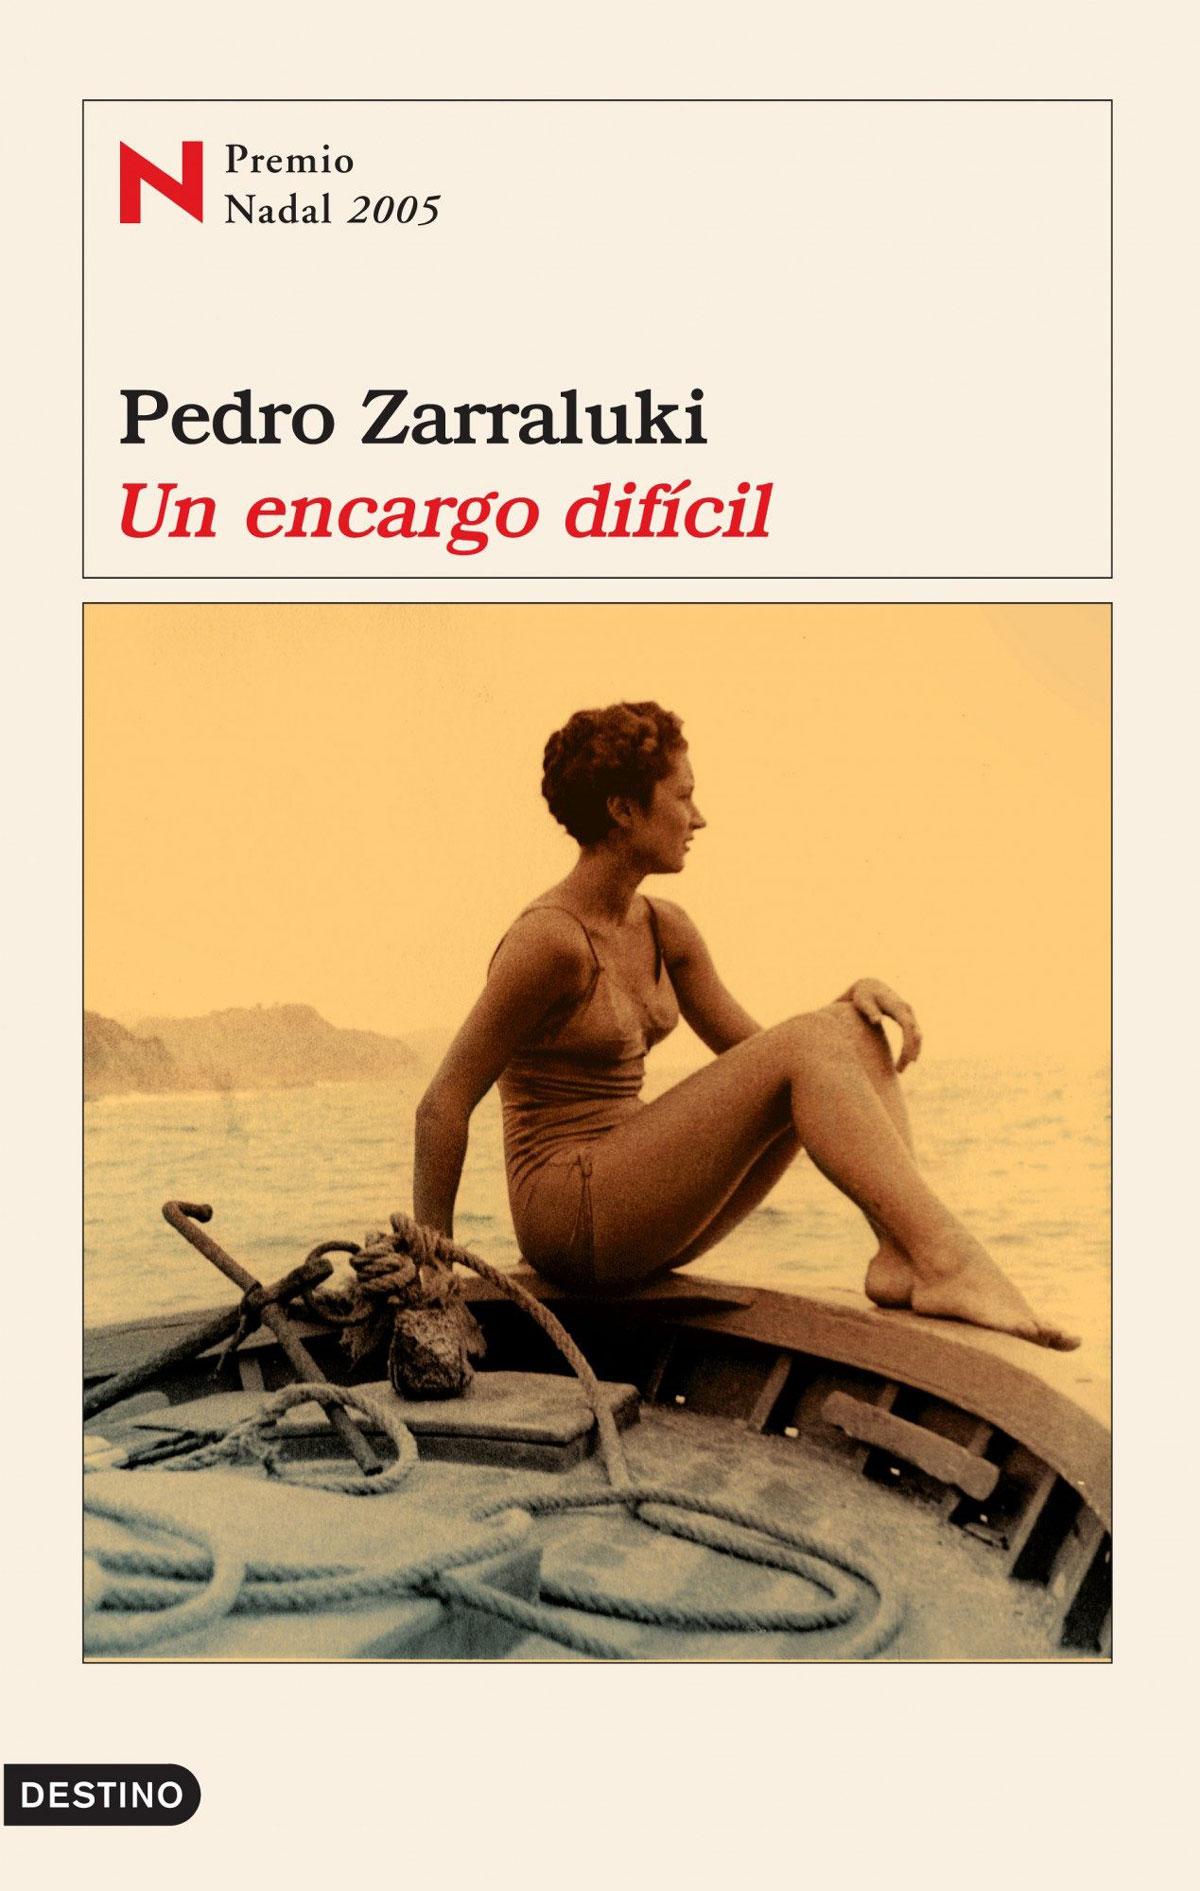 Portada de la novela Un encargo difícil, de Pedro Zarraluki